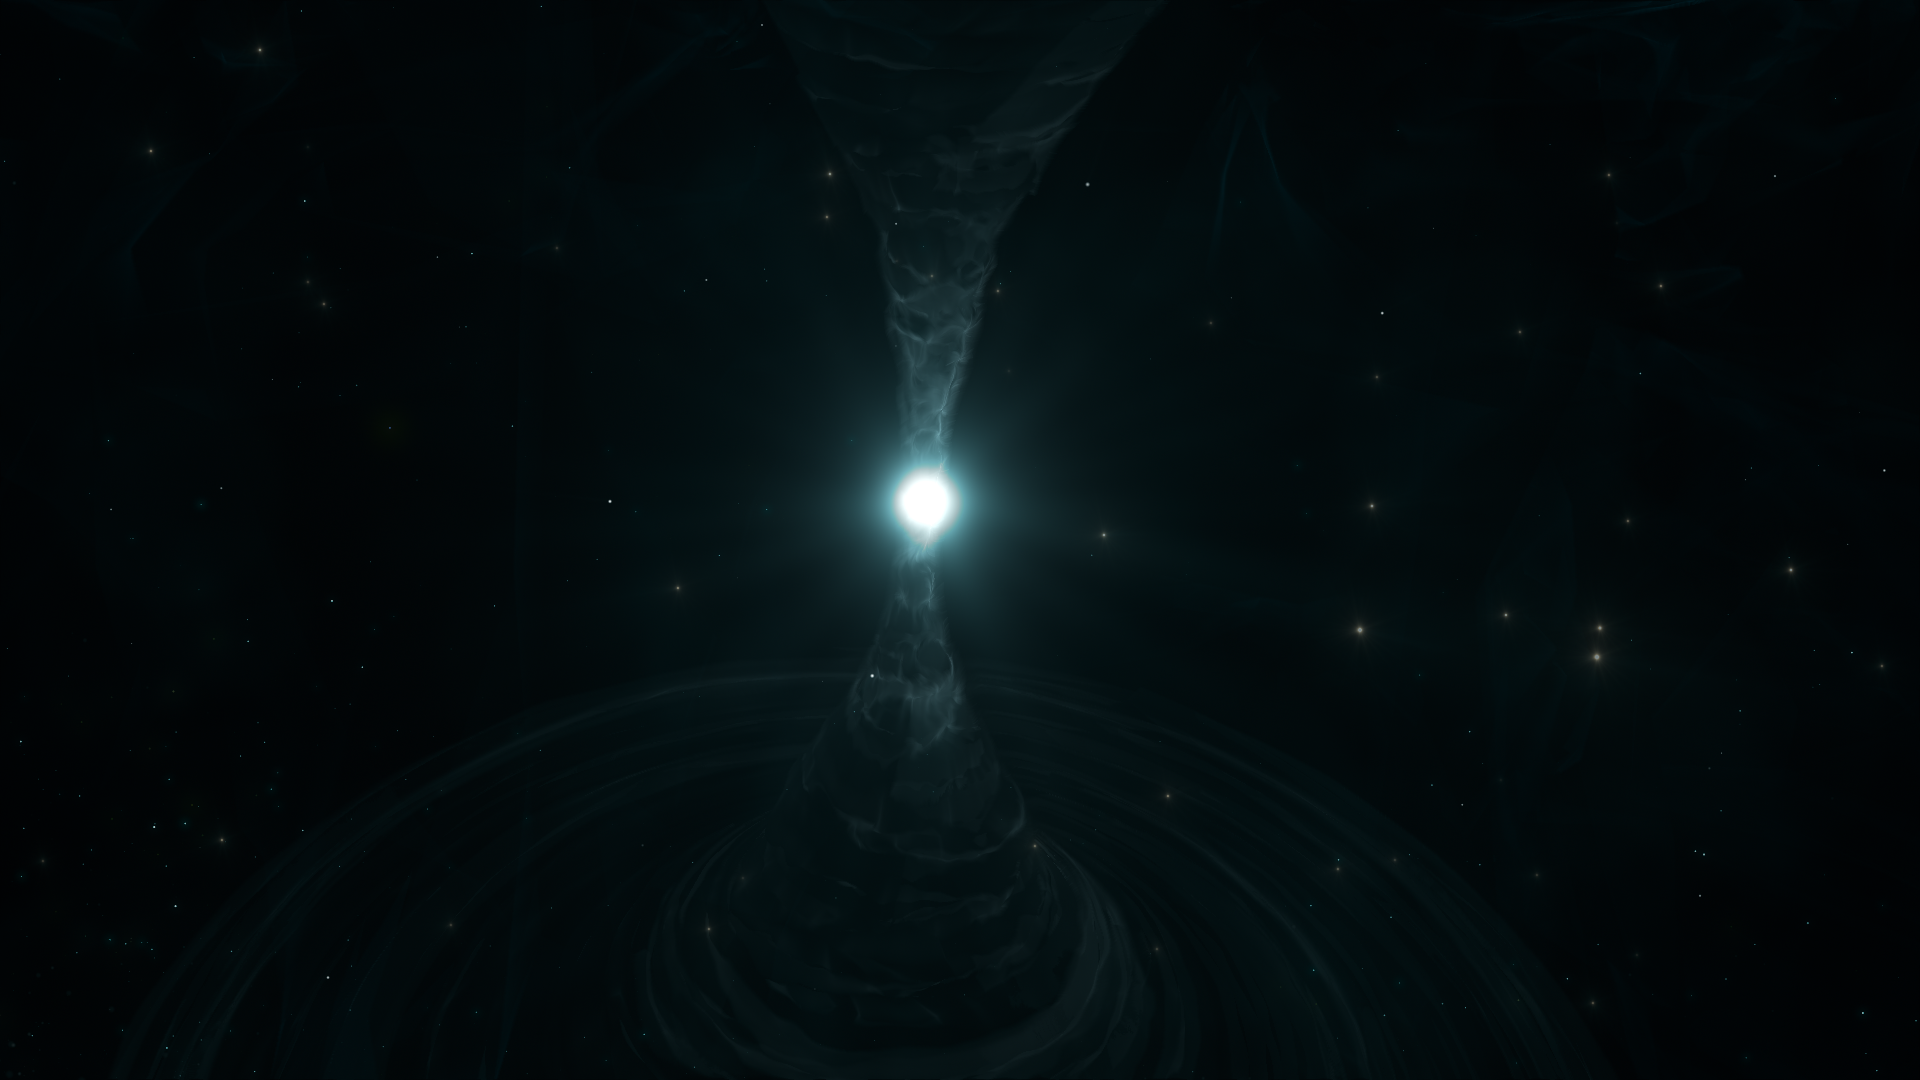 2014-Form-galaxy-explosion_00442